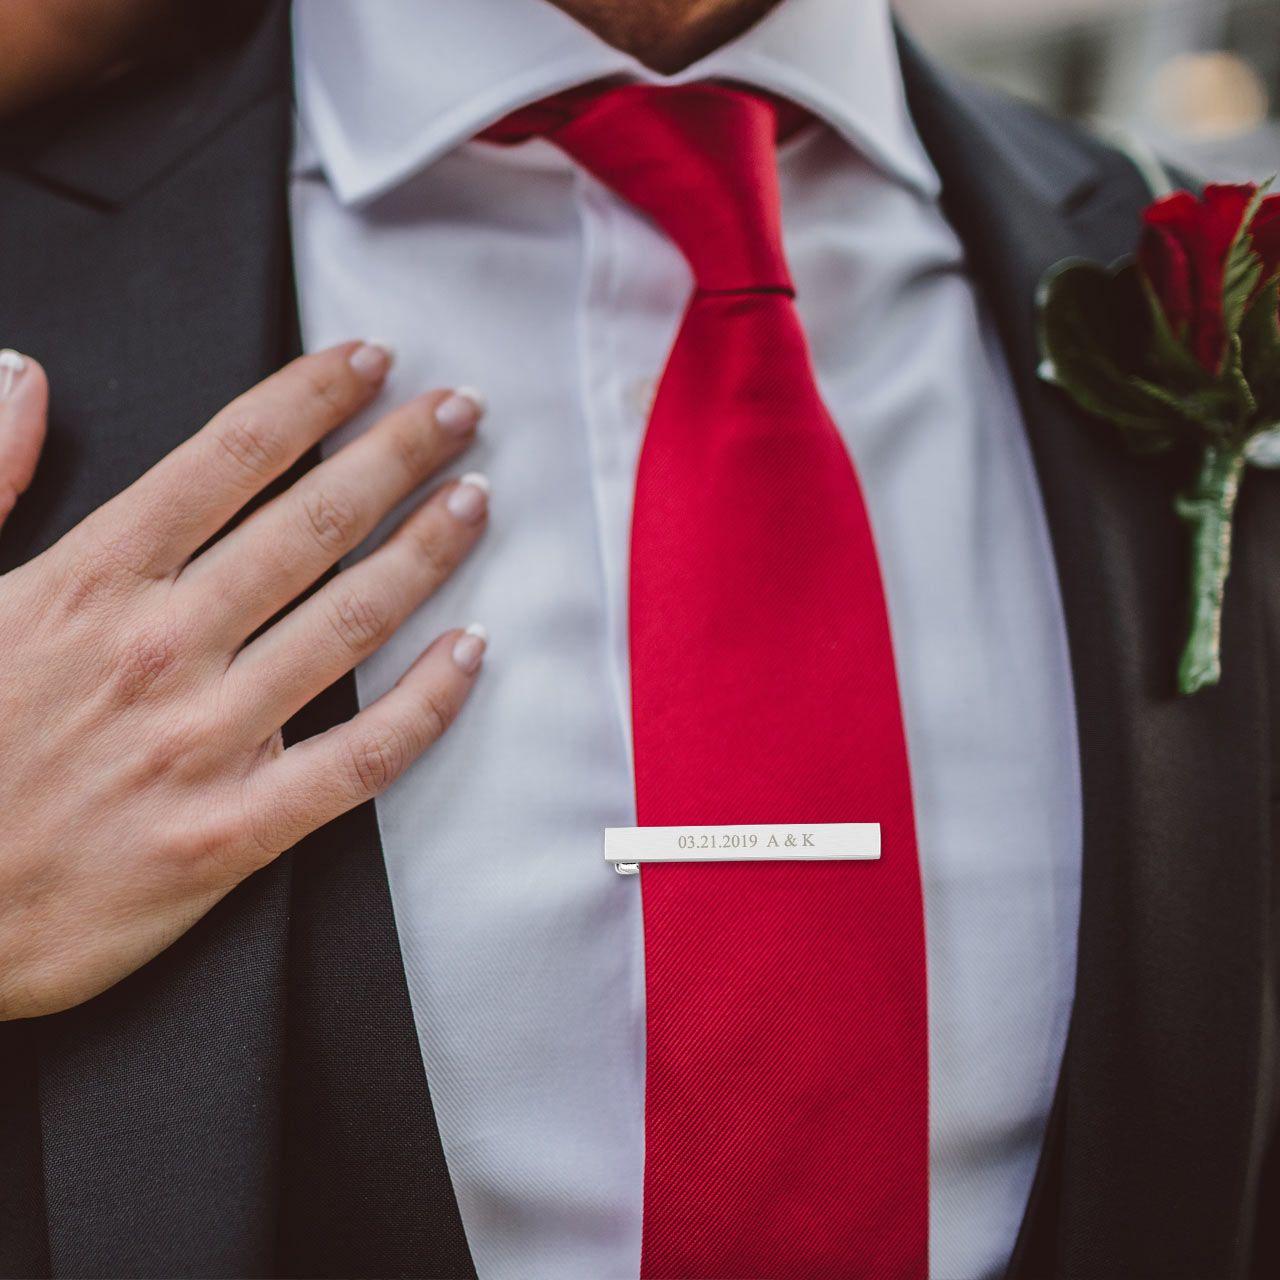 Custom Tie Bar Red Gift Tie clip Red Tie Bar Groomsmen Gift Custom Tie Clip Personalized Tie Bar Red Tie Clip Red Wedding Tie Bar